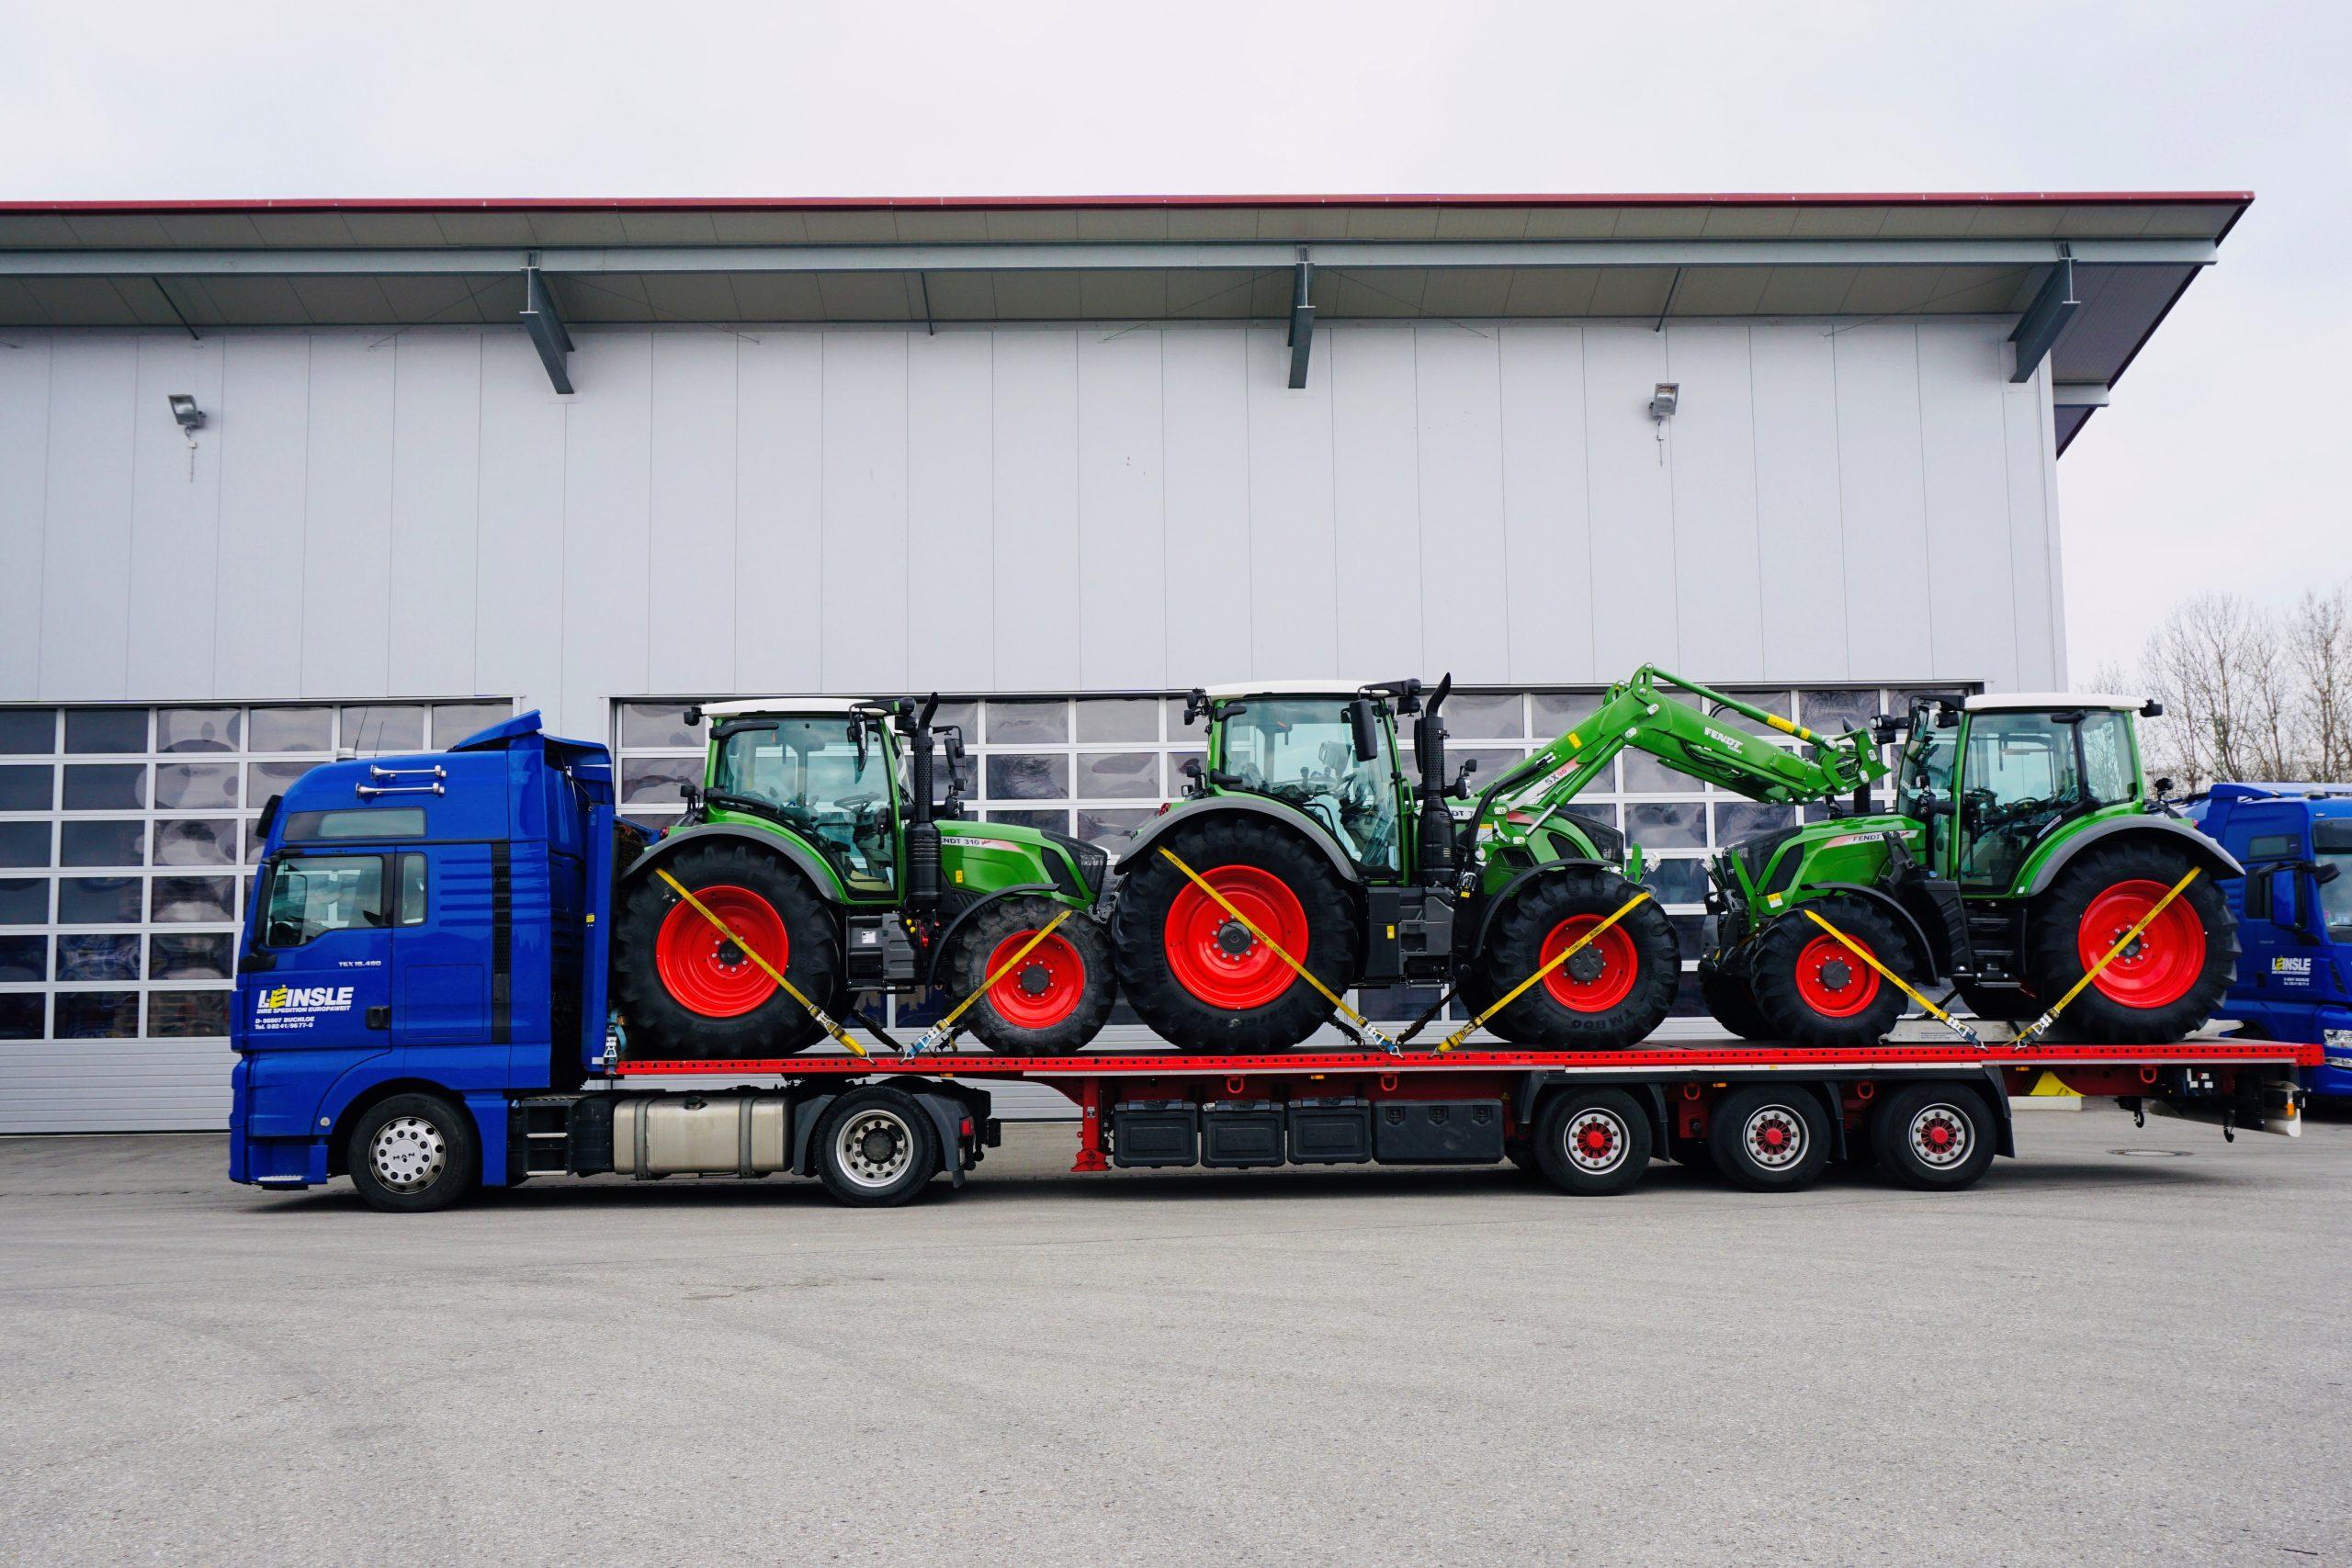 https://www.leinsle.com/wp-content/uploads/Traktortransport-e1578930660404.jpg